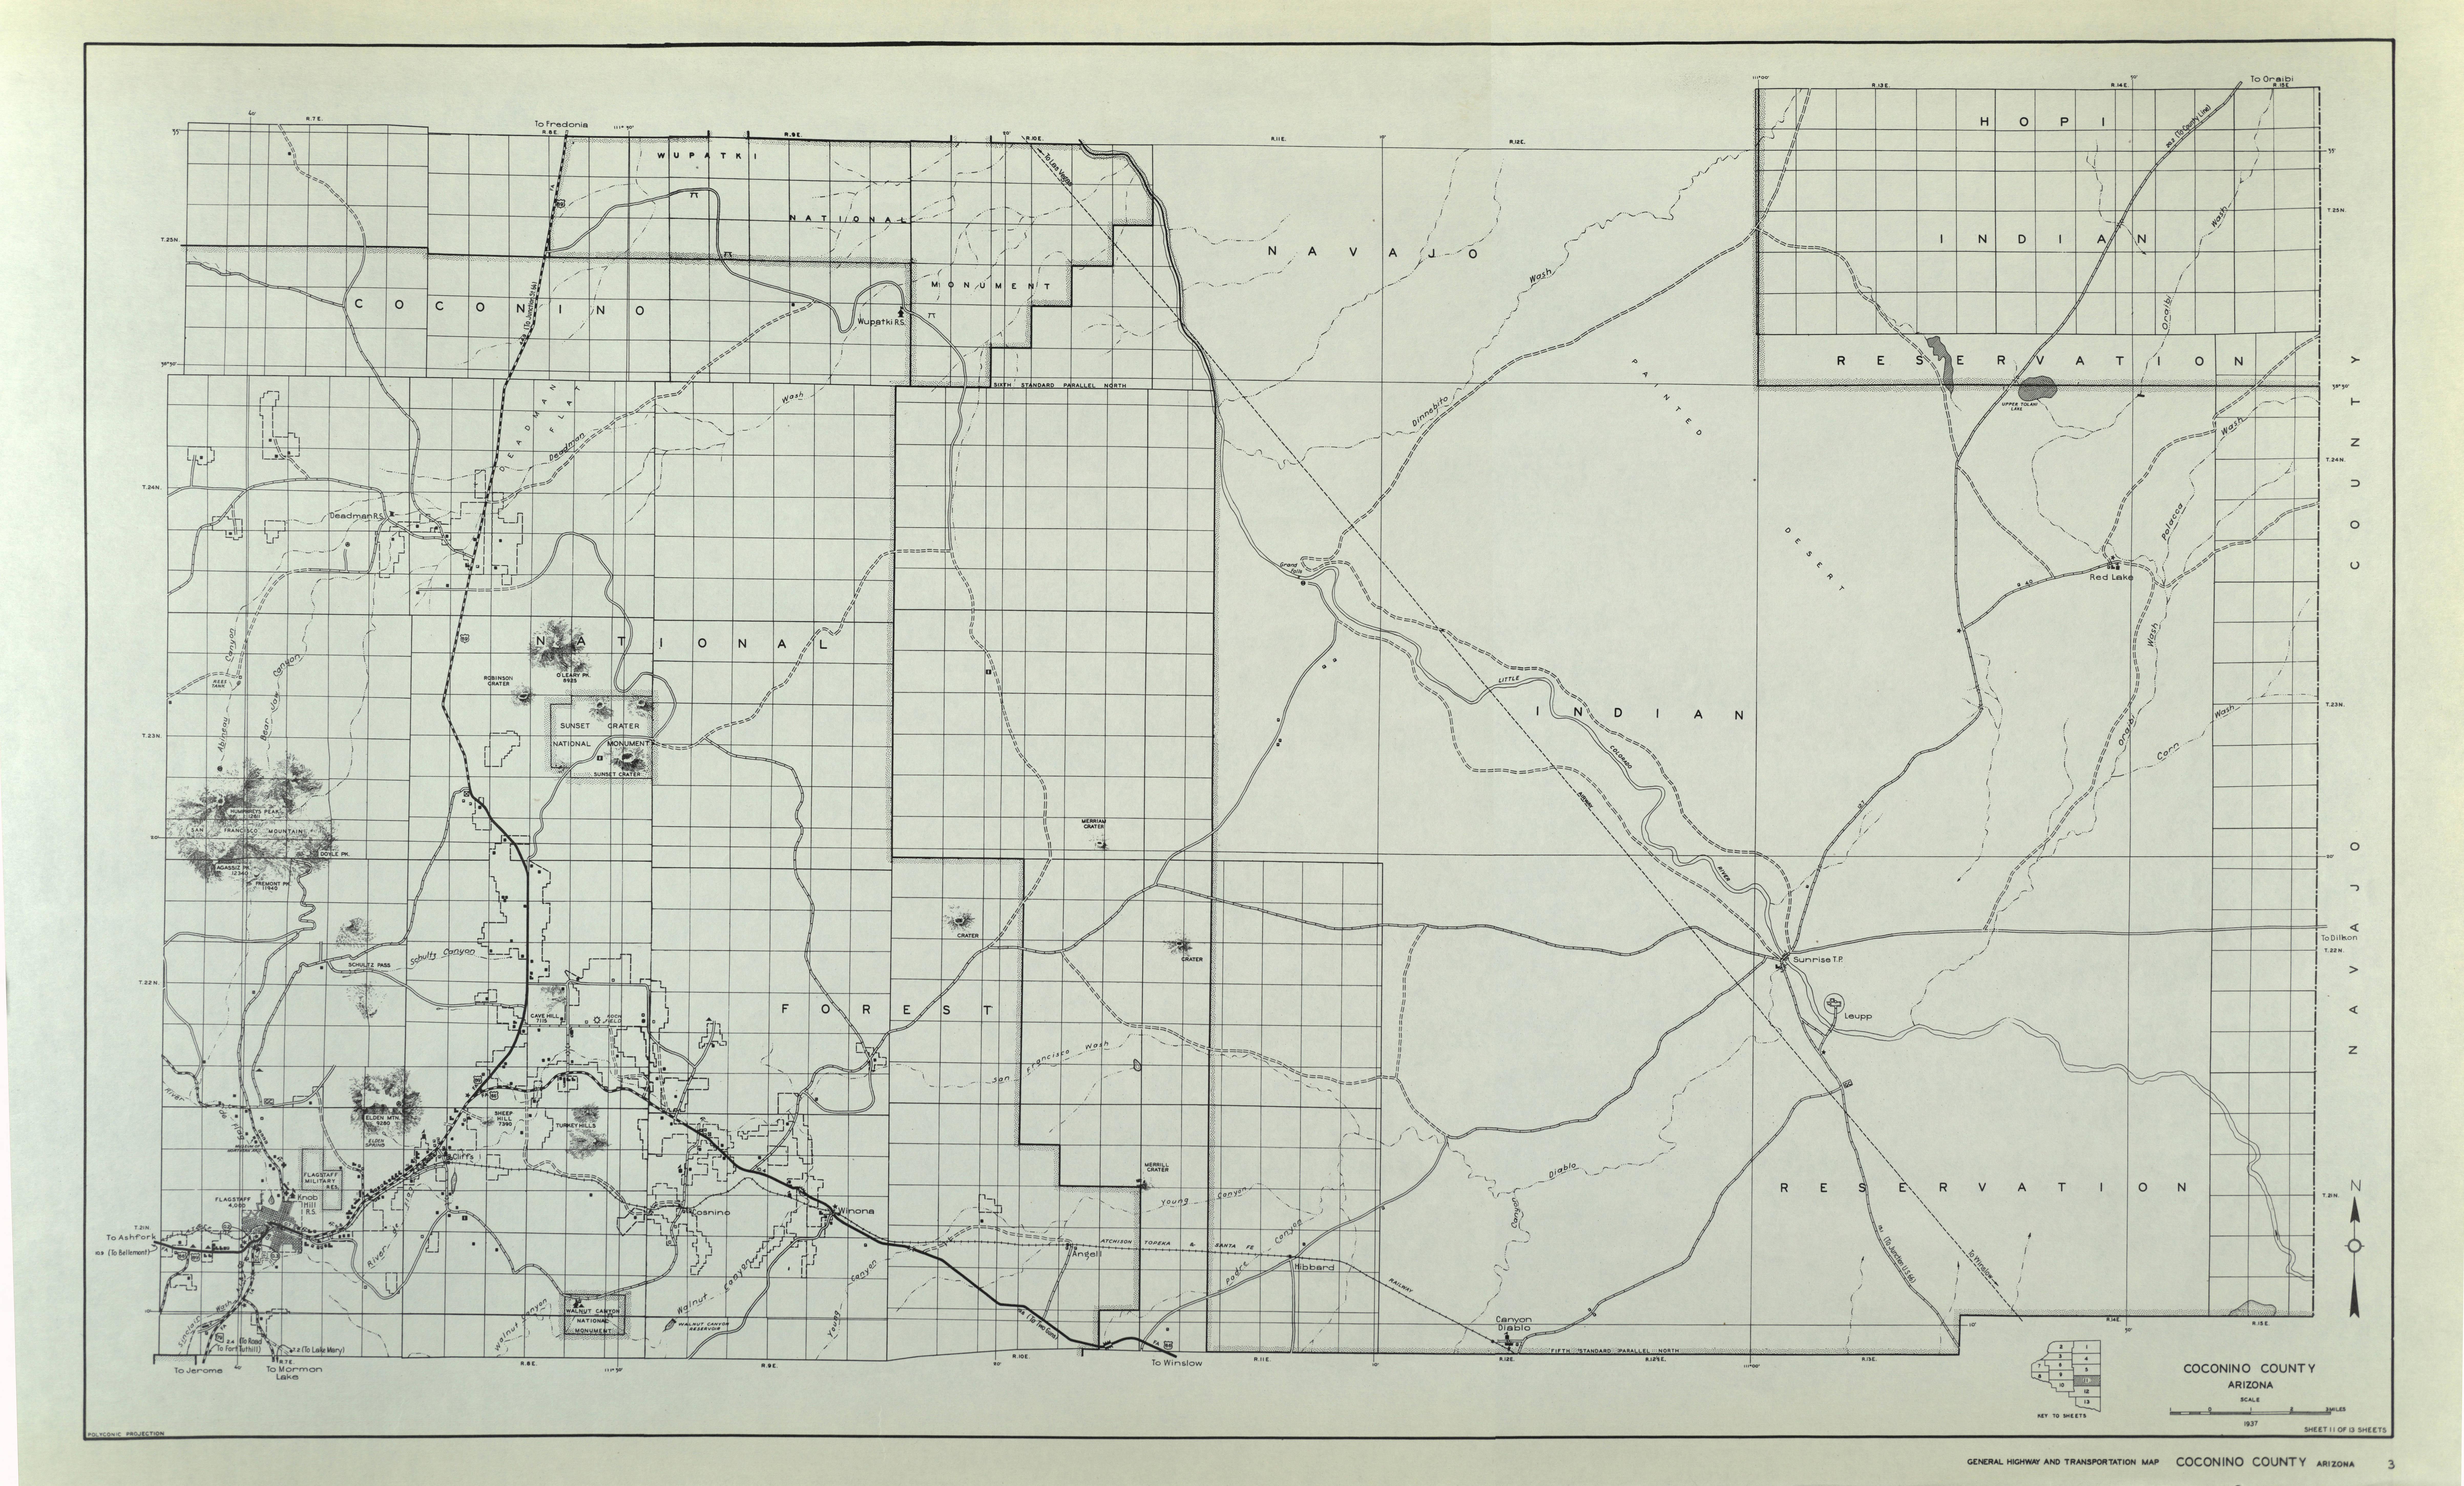 Apache County Arizona Map.1937 Arizona State Highway Maps For 66